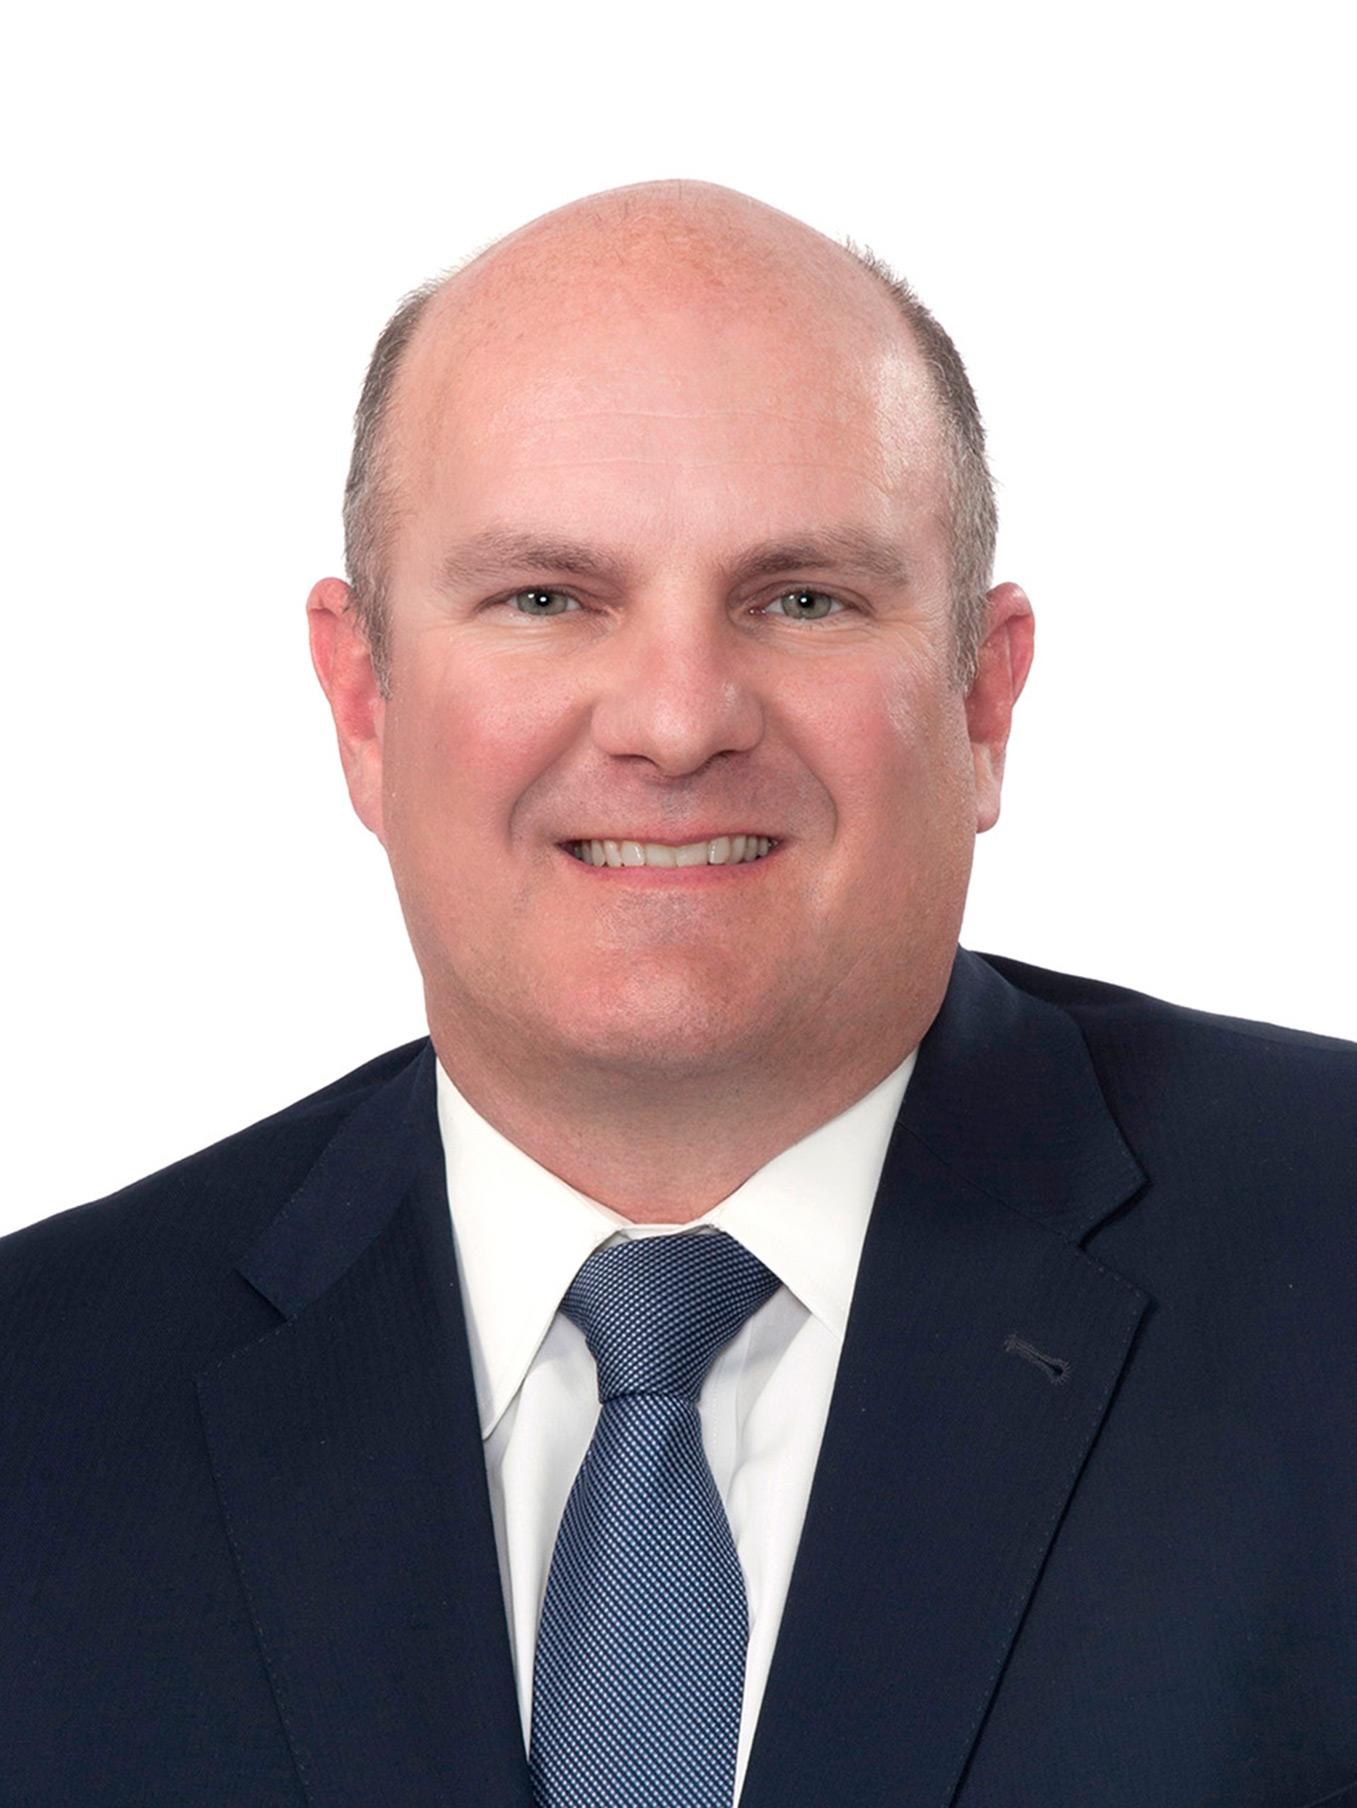 Craig A. Hill, CFP®, Senior Vice President of Day Hagan Asset Management in Sarasota, FL.